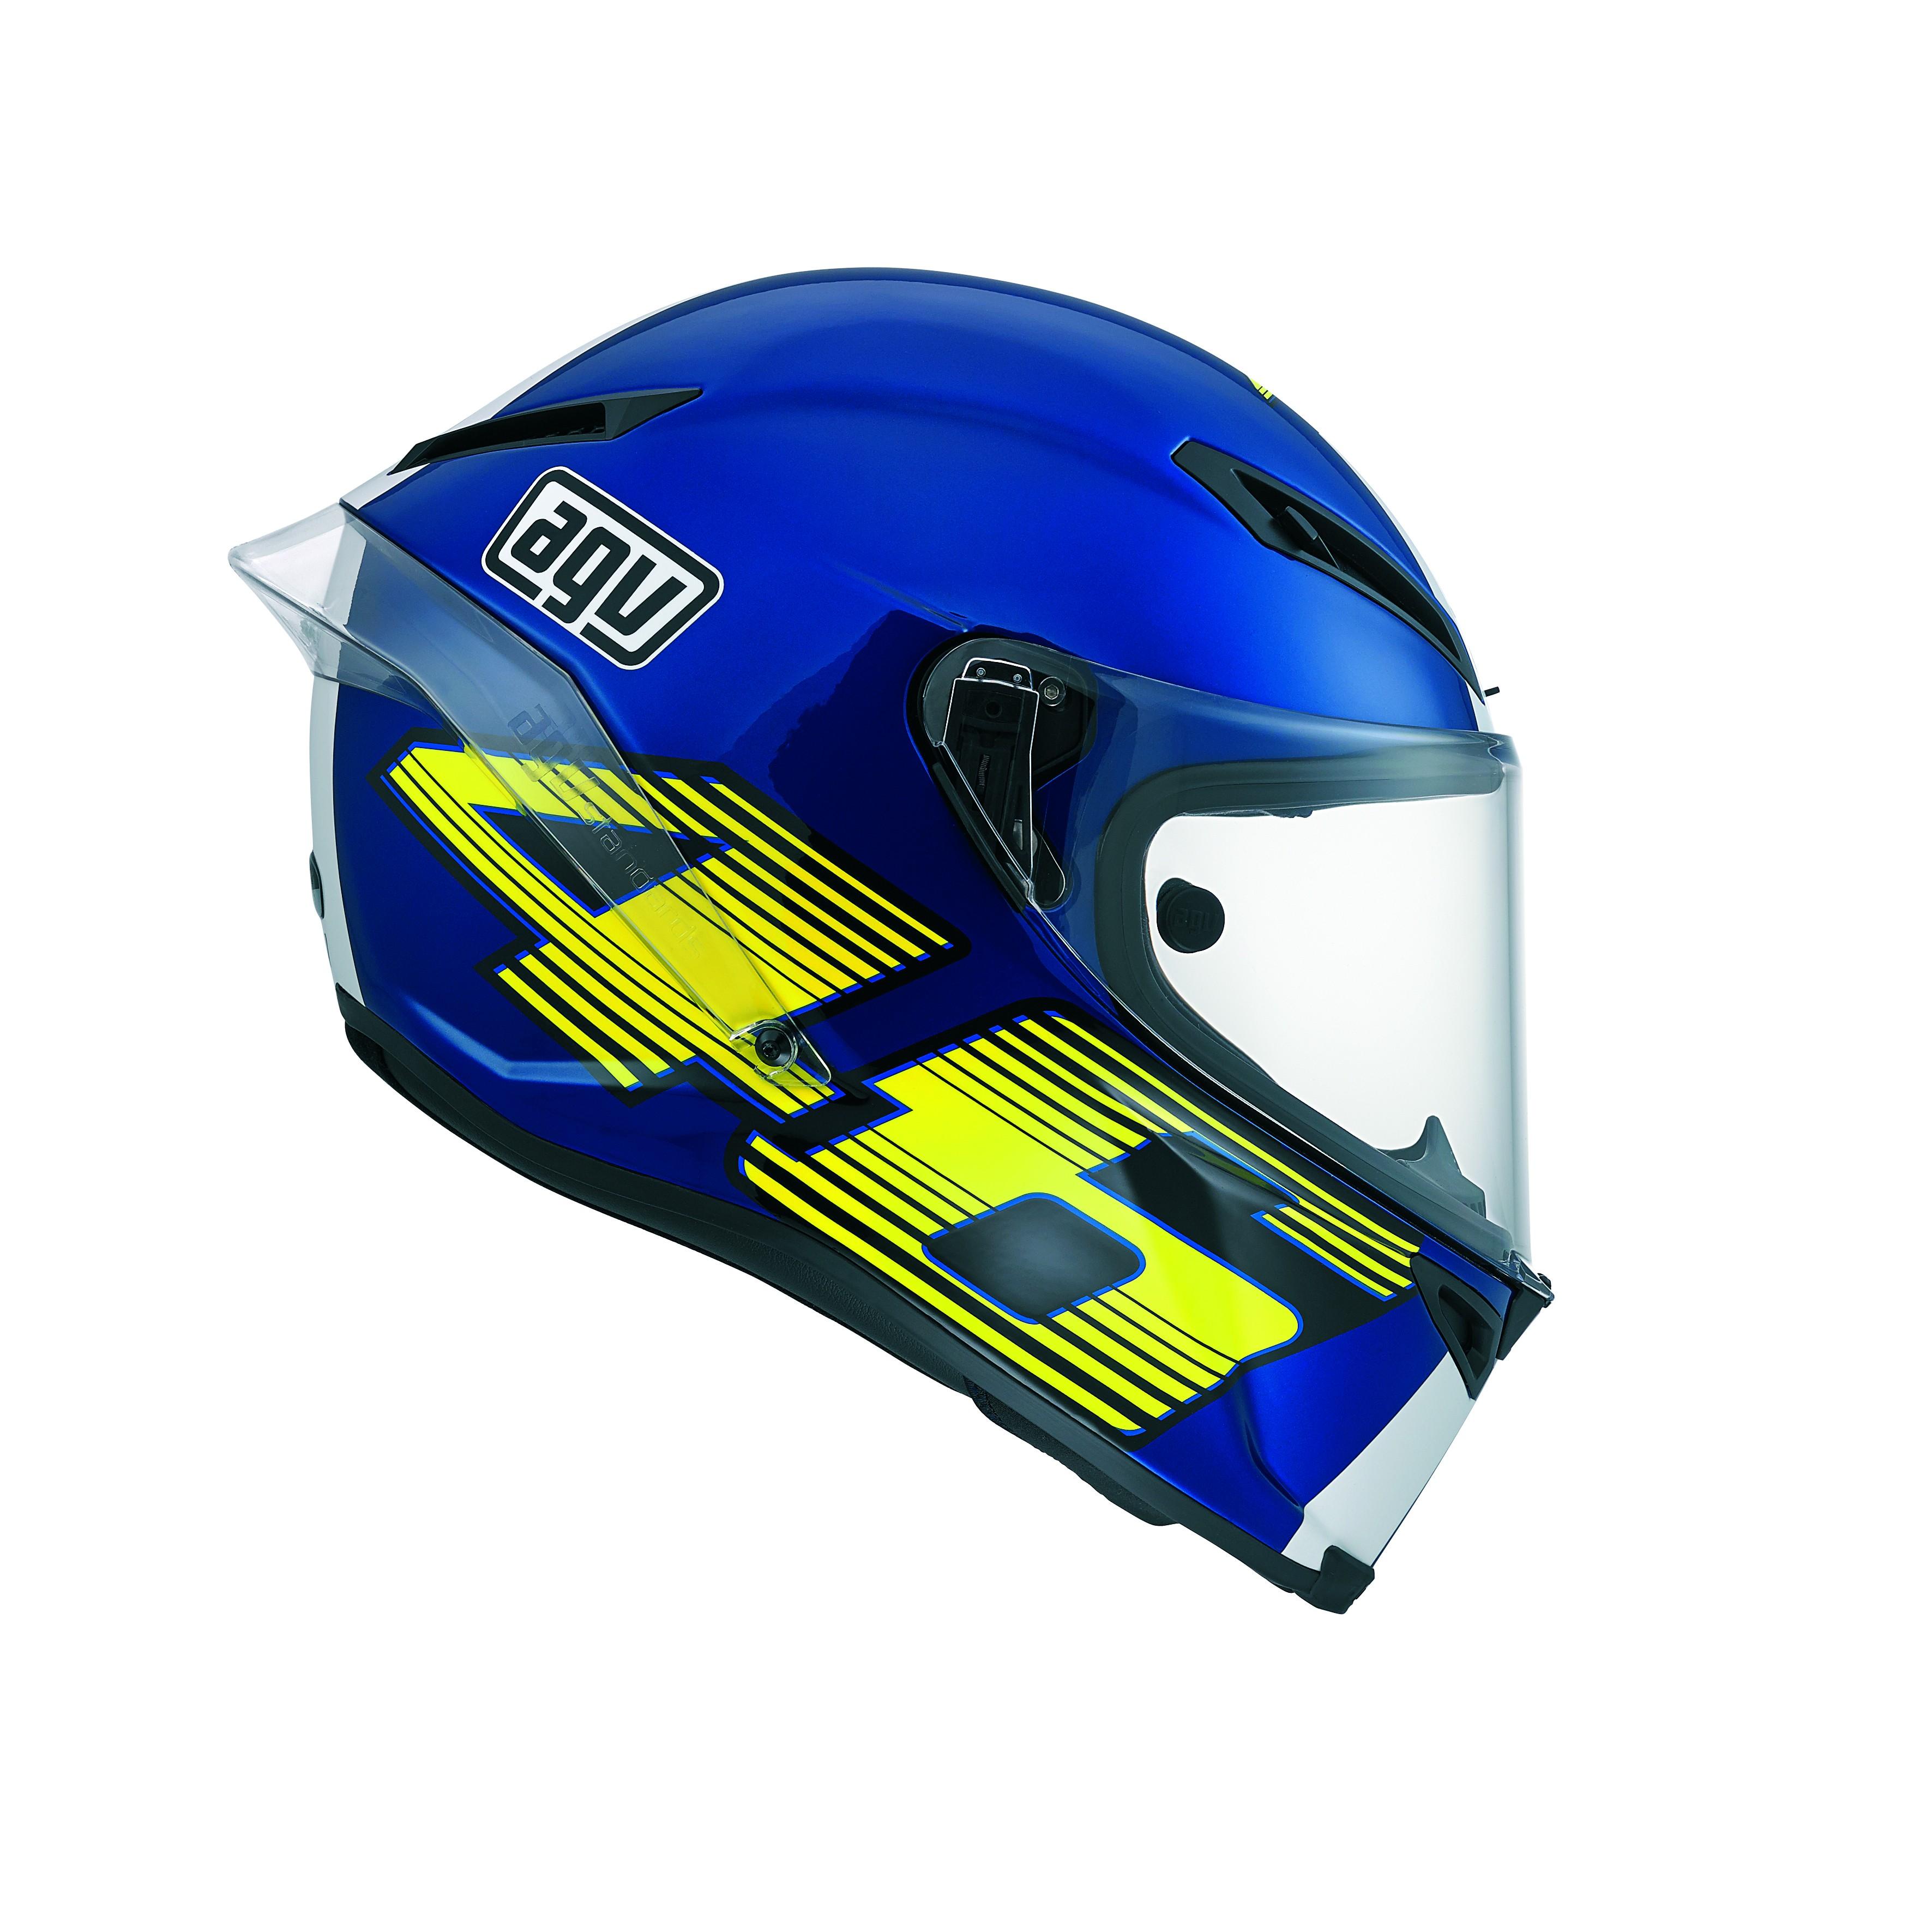 AGV Corsa 46 Motorcycle Helmet